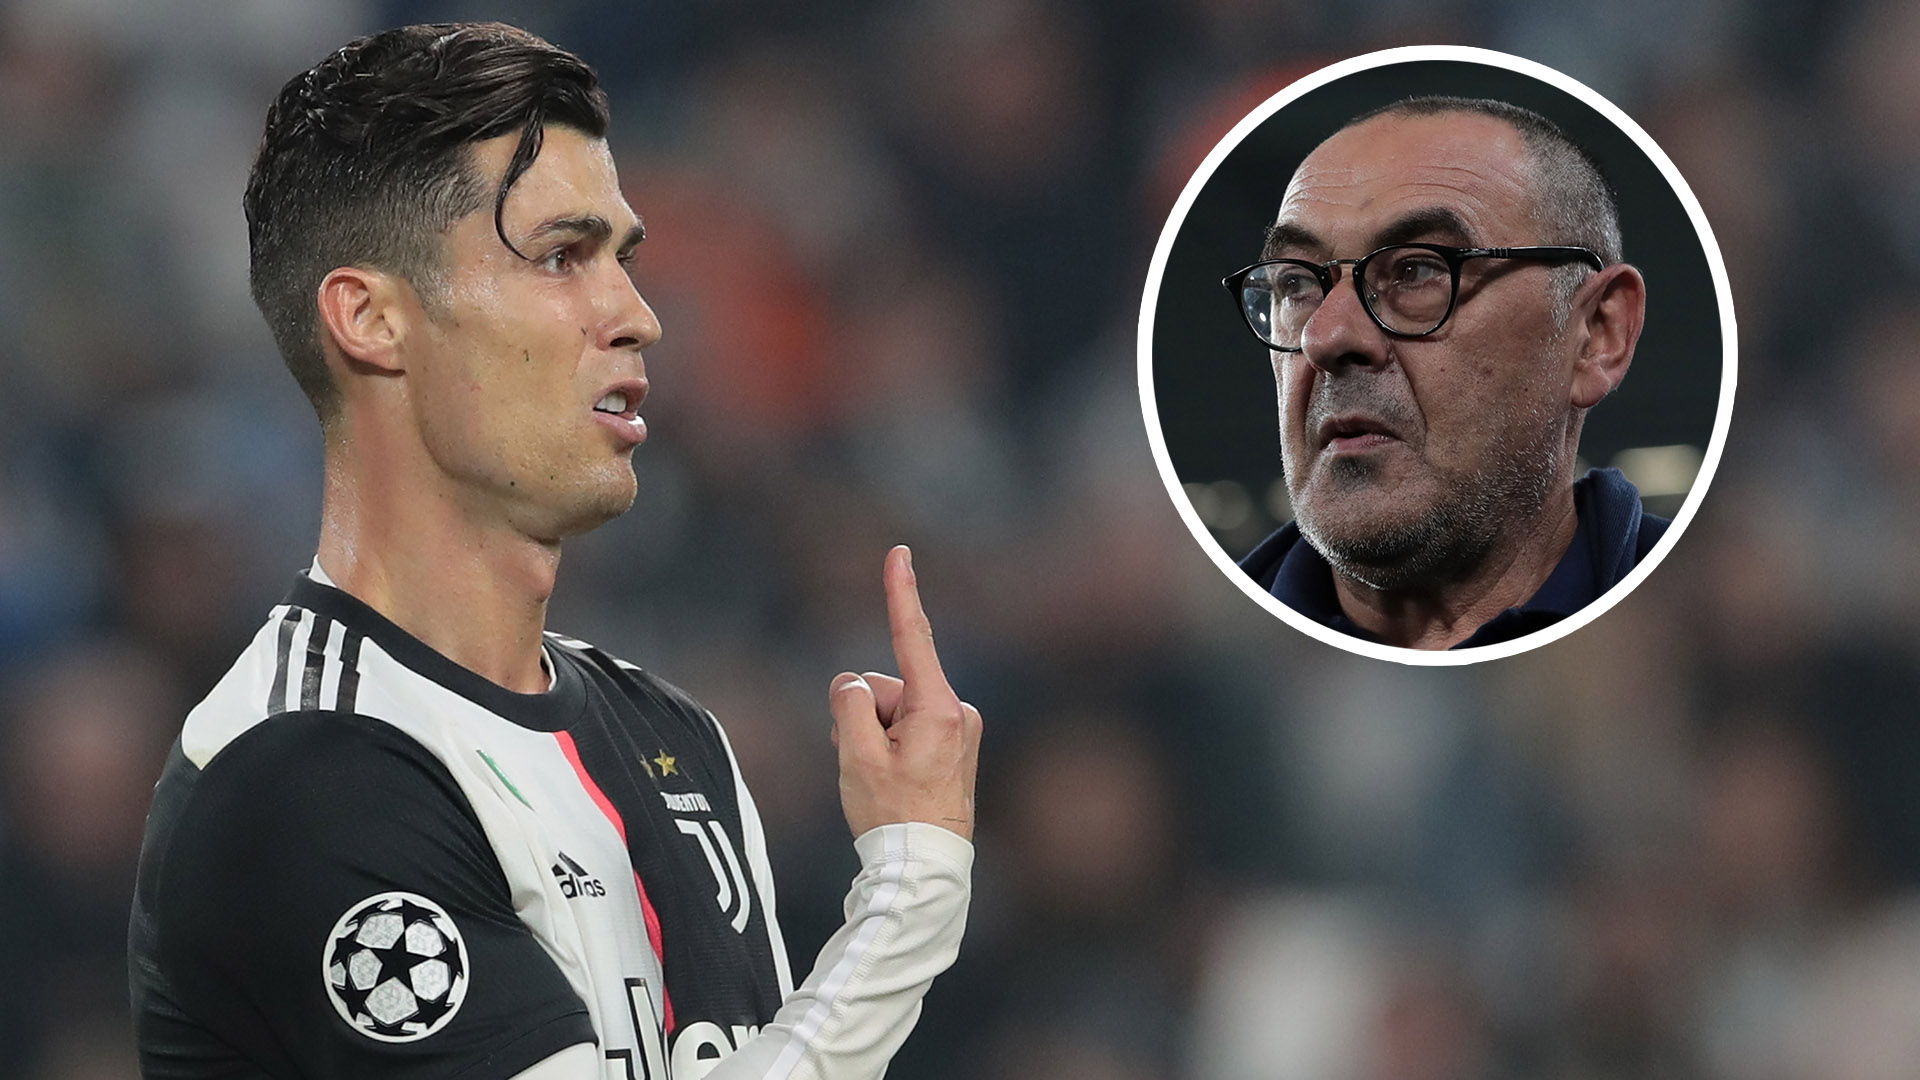 'How can you play like that?' - Ronaldo's sister slams Sarriball at Juventus